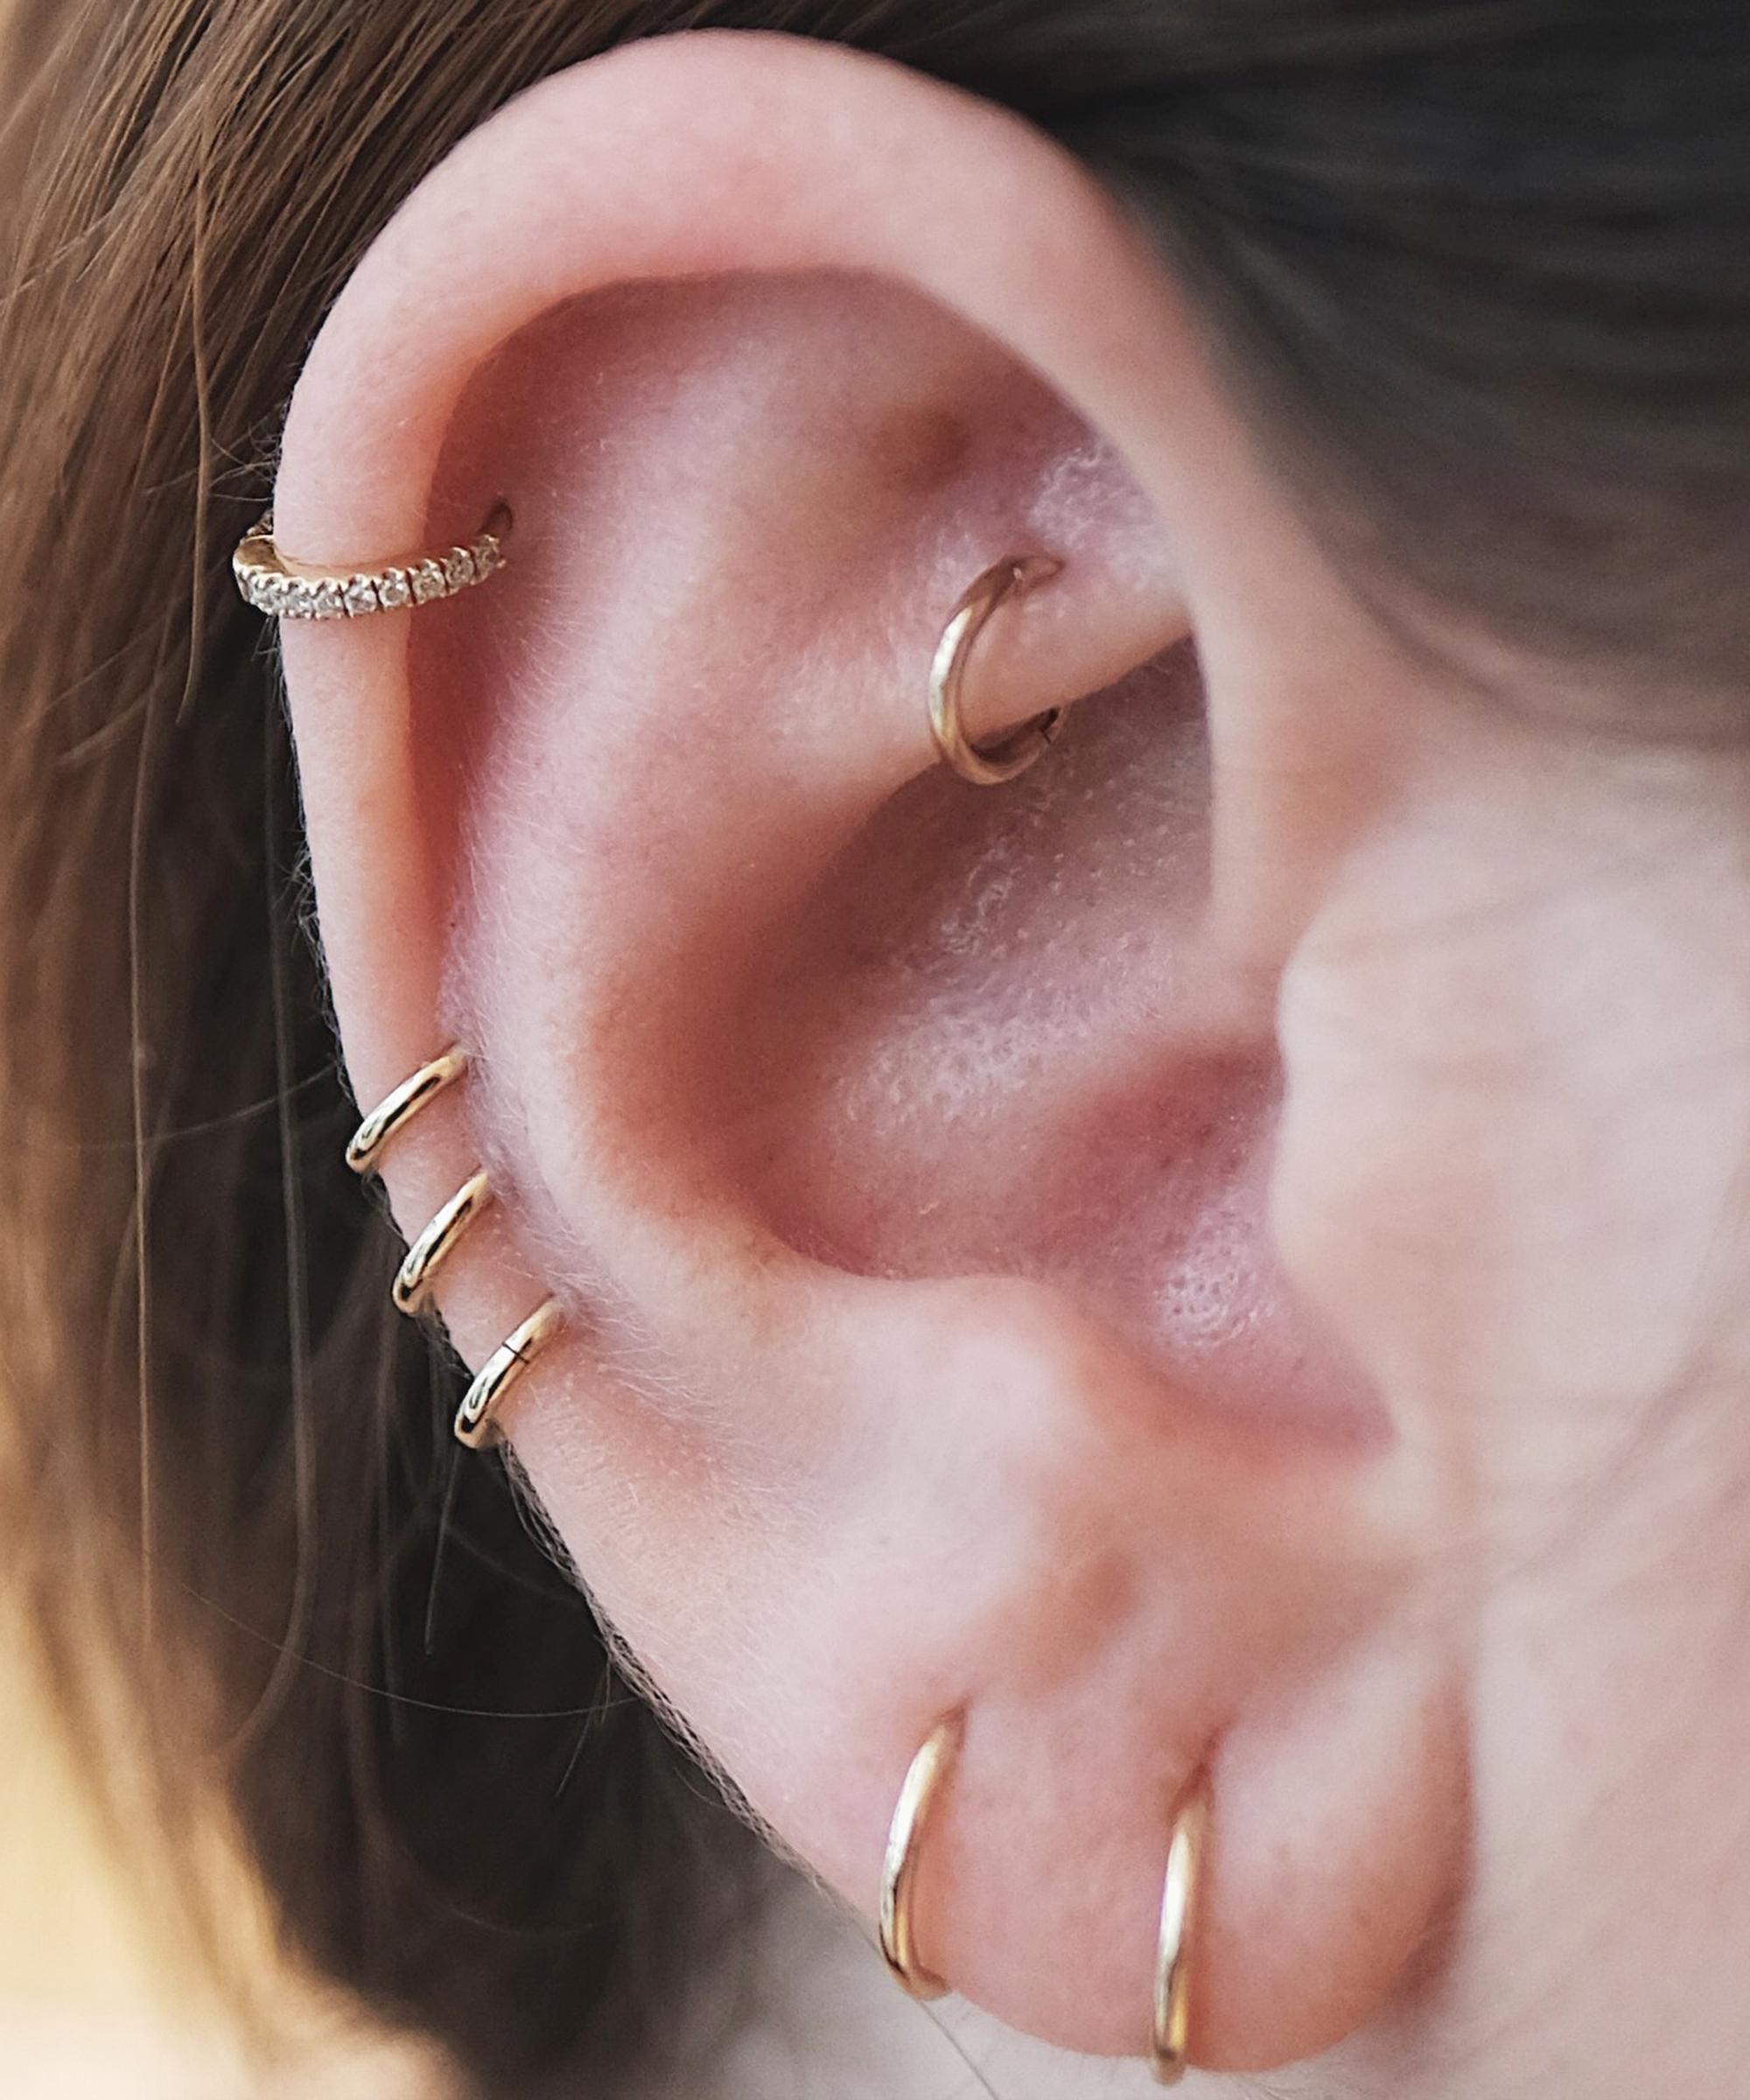 Ear With Earring Ear Crawler Pin Cuff Climber Earring With